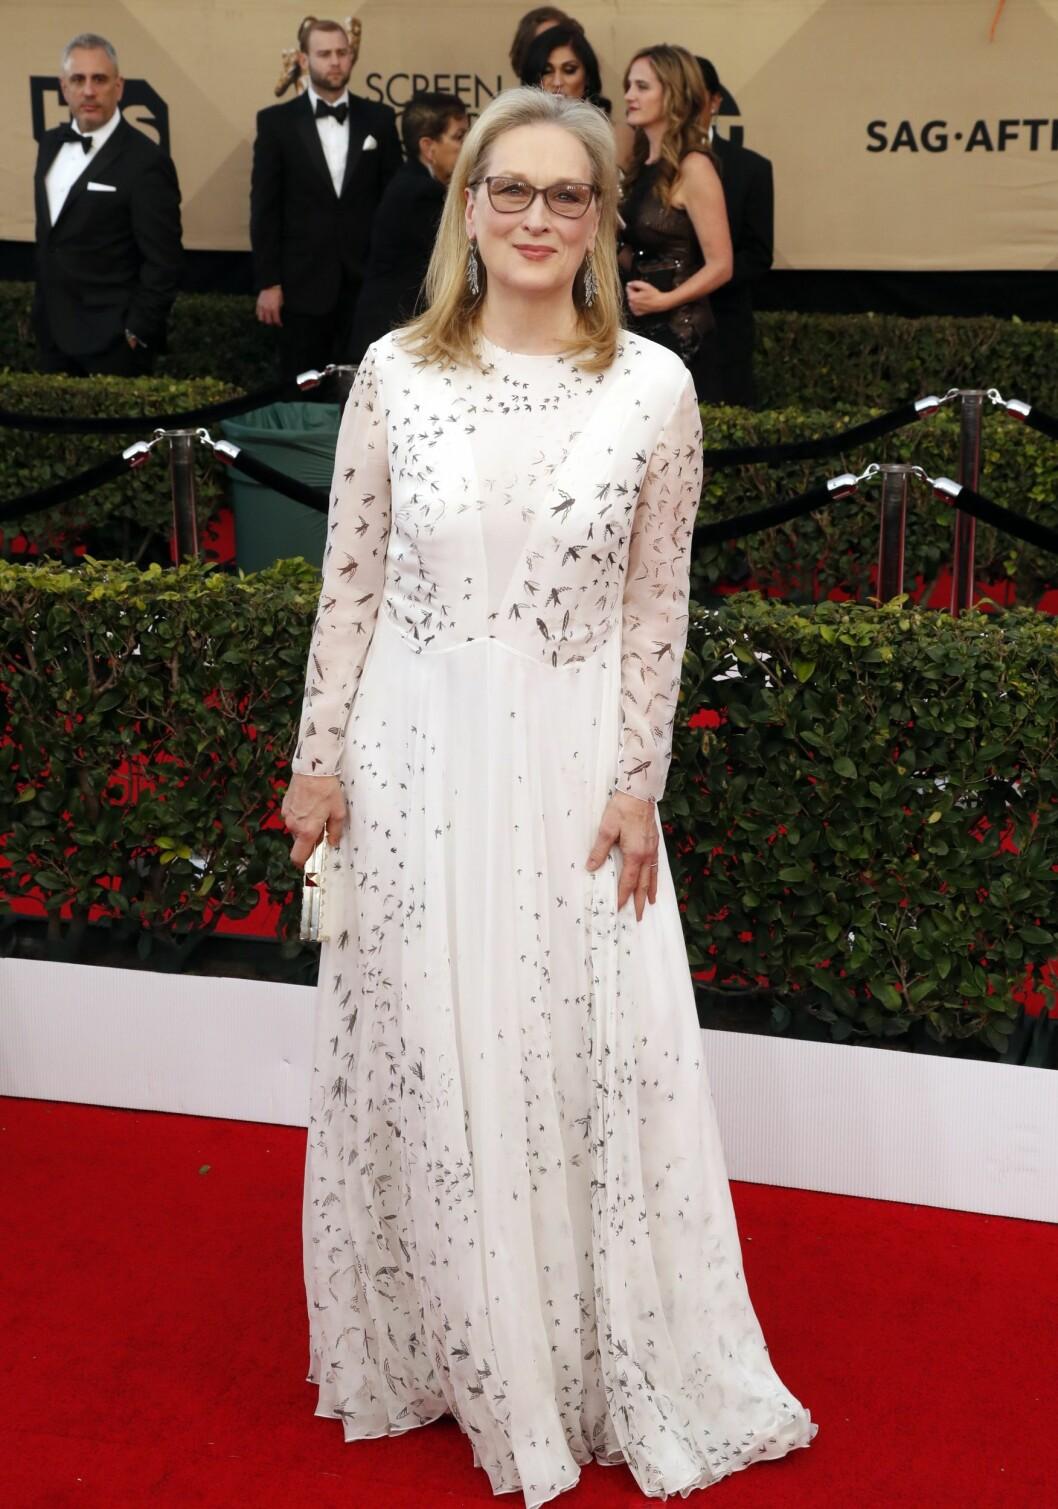 SAG AWARDS 2017: Meryl Streep i Valentino Foto: Epa